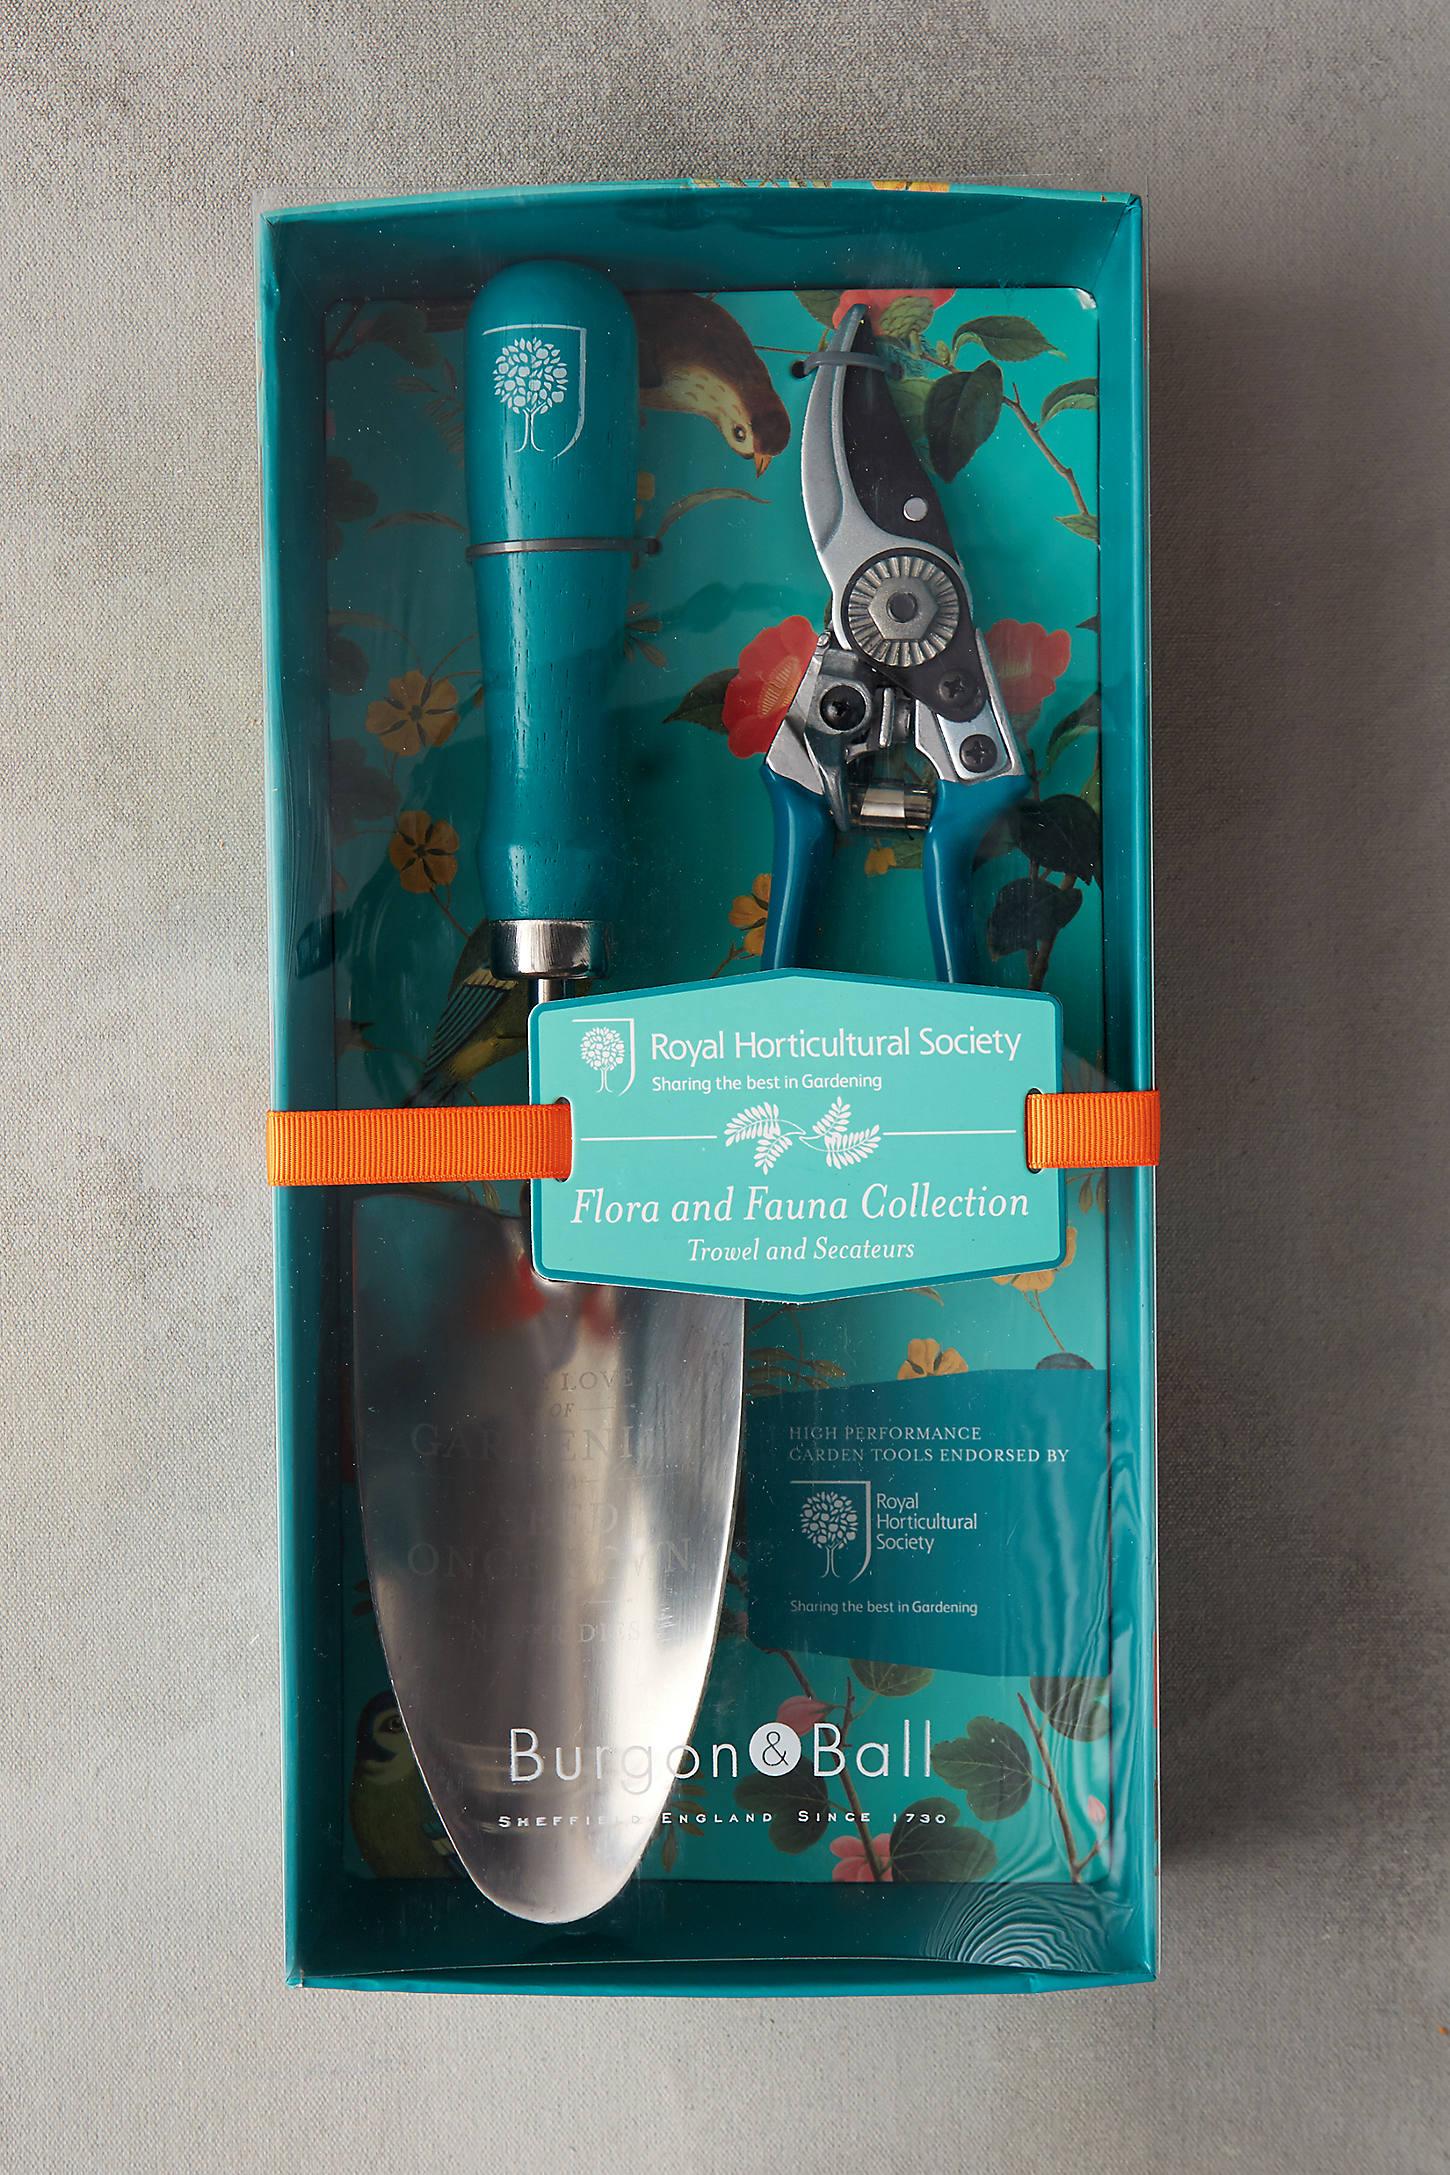 Burgon & Ball Trowel and Pruner Gift Set